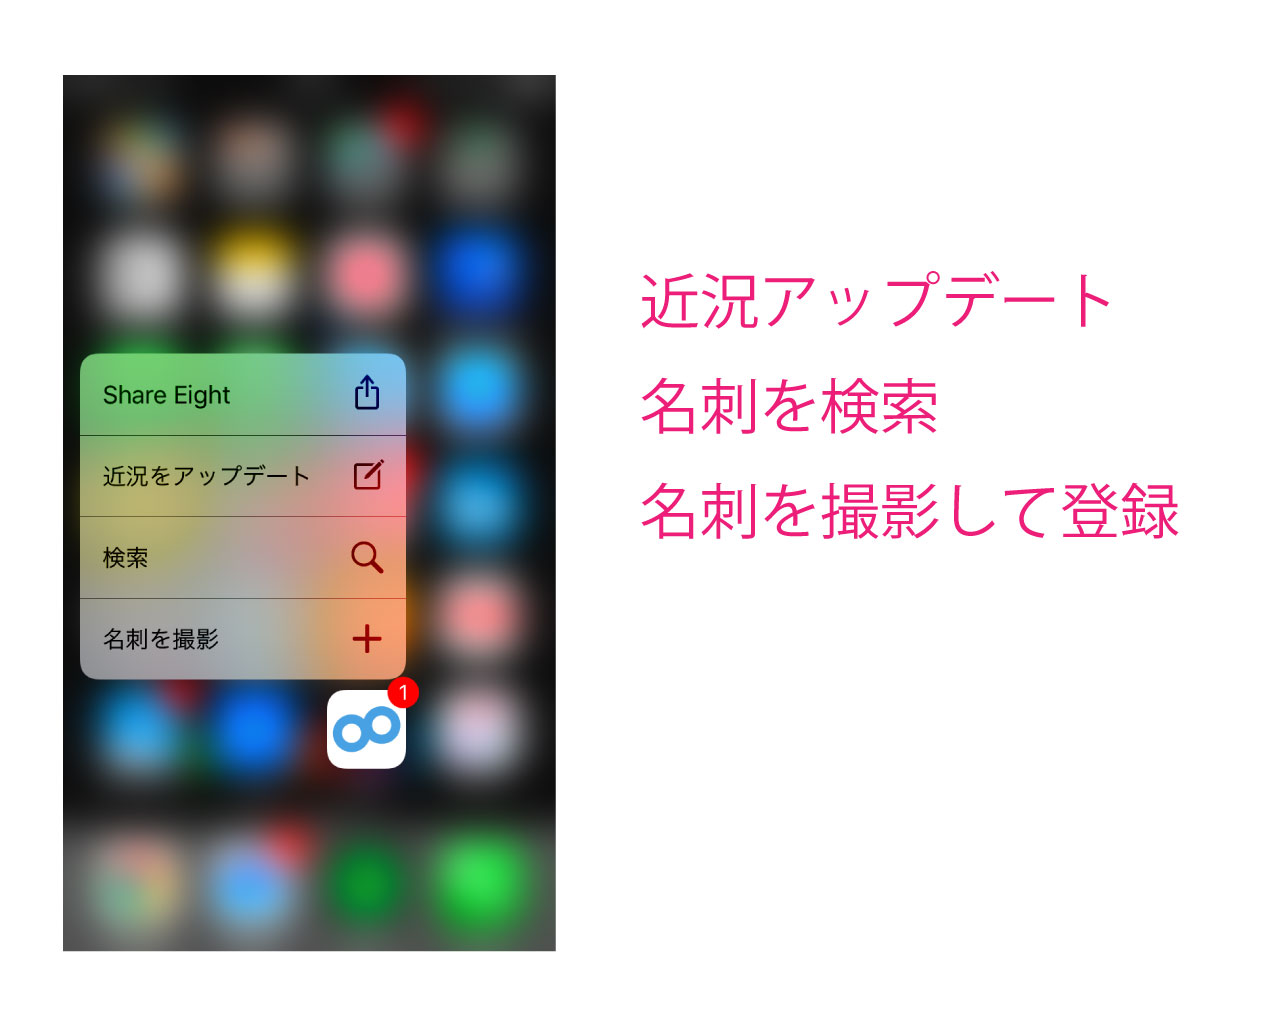 iphone-3dtouch-app-icon-shortcut-memu-7